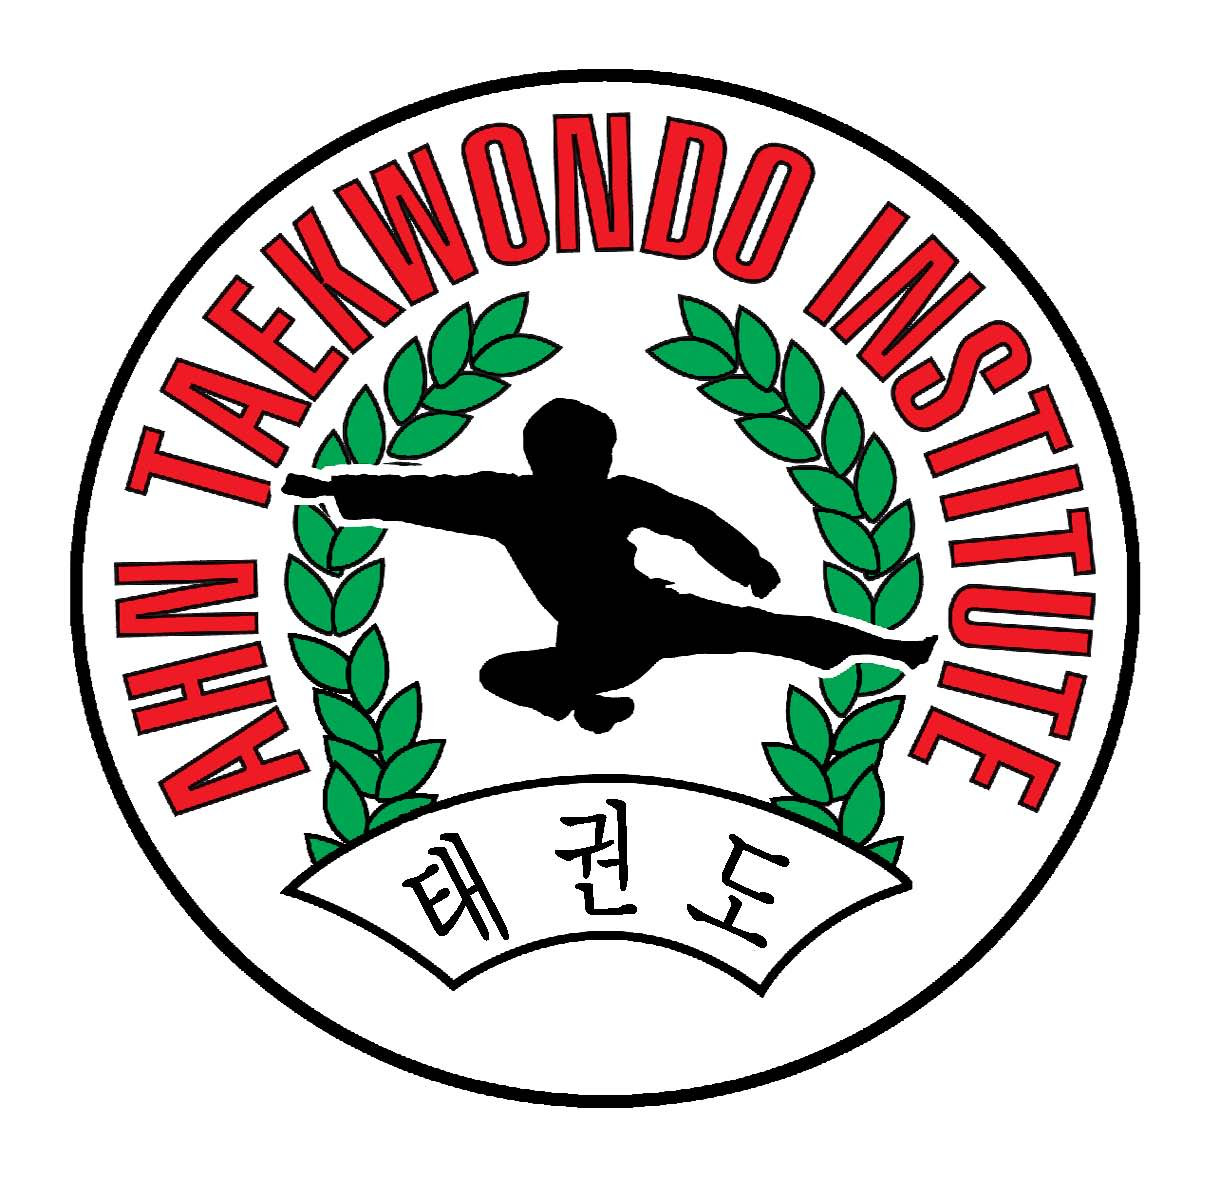 Taekwondo Introduction Classes